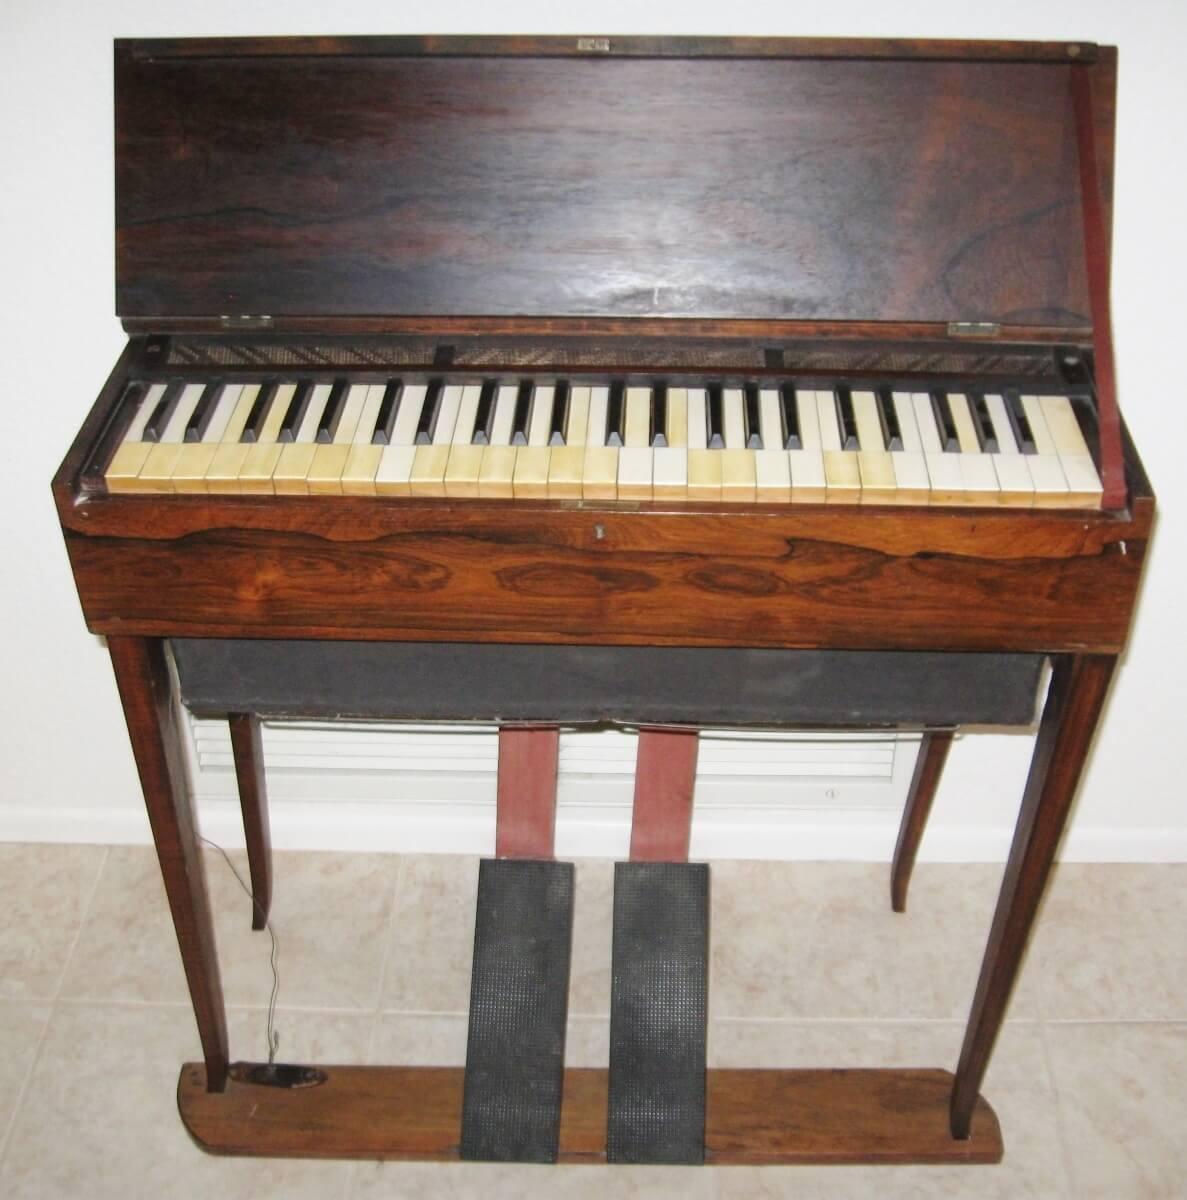 Antique (1800s) Wooden Pump Organ with Folding Legs